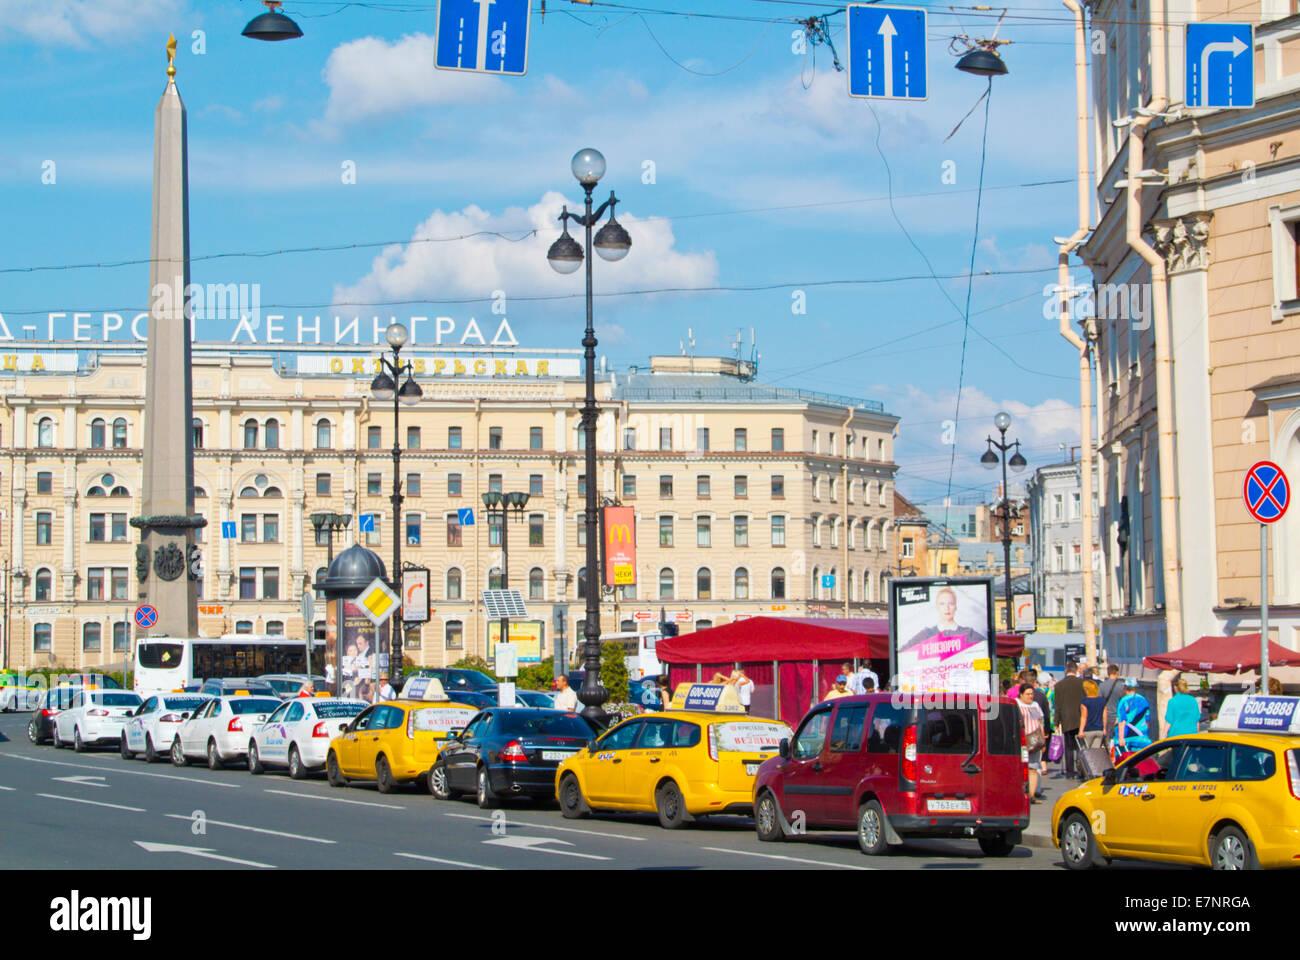 Traffic at Ploshchad' Vosstaniya, corner of Nevsky Prospekt, Saint Petersburg, Russia, Europe - Stock Image